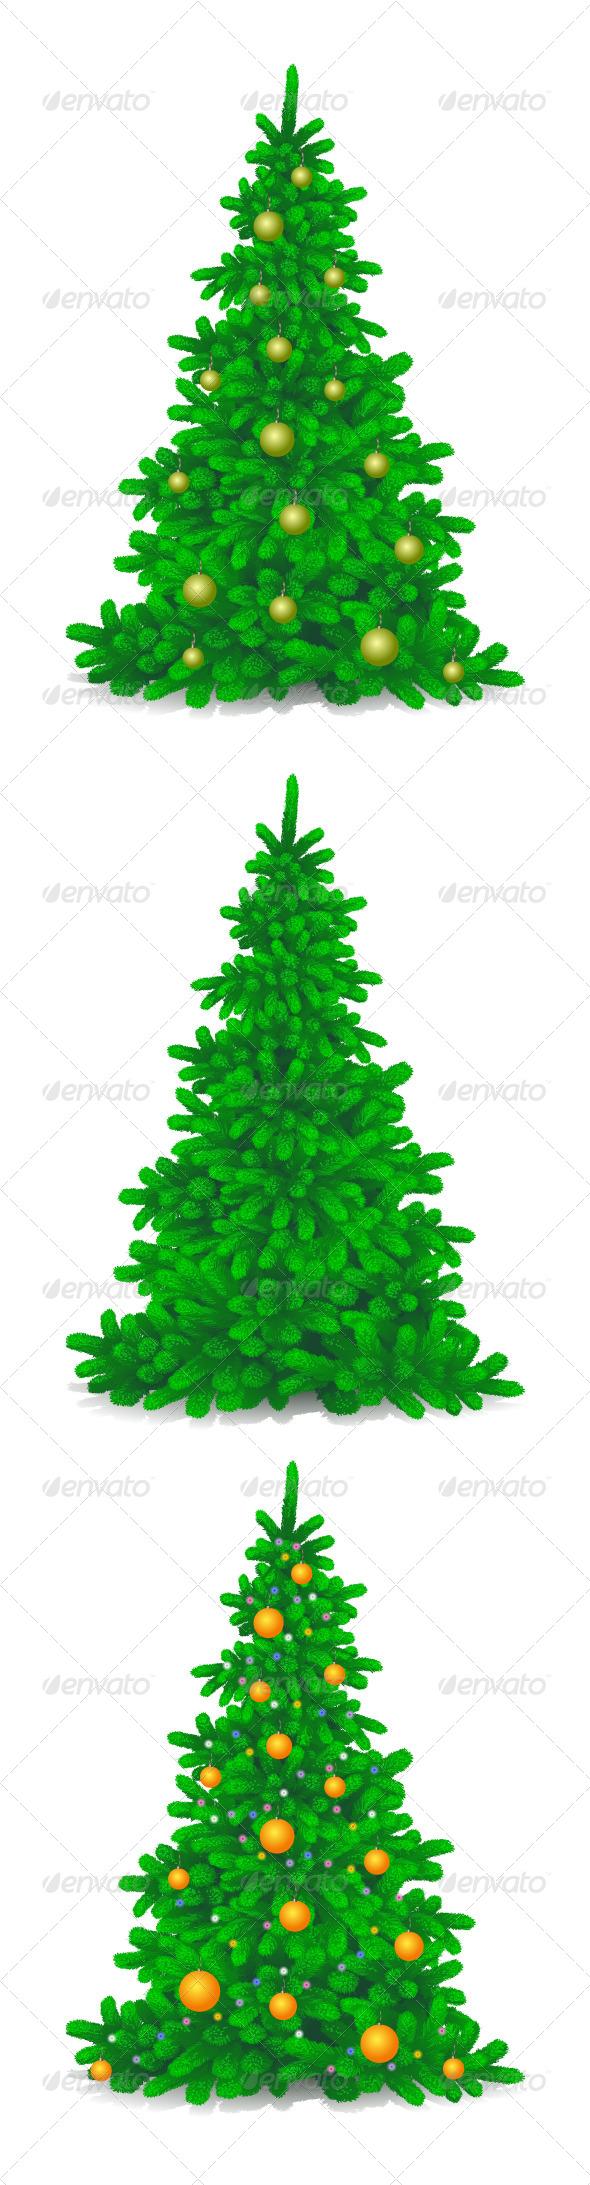 GraphicRiver Christmas Trees 6430062